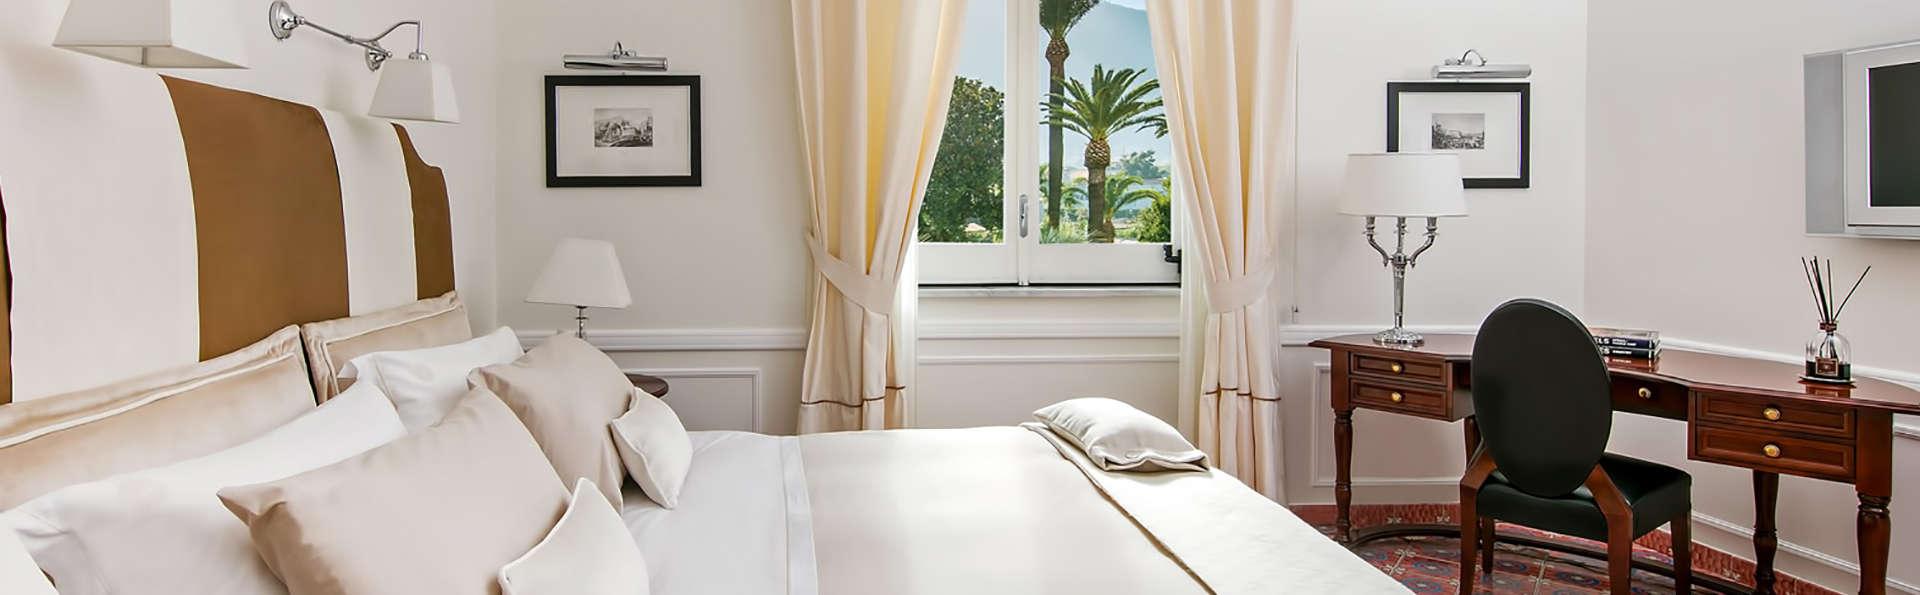 La Medusa Hotel & Boutique Spa - edit_room3.jpg